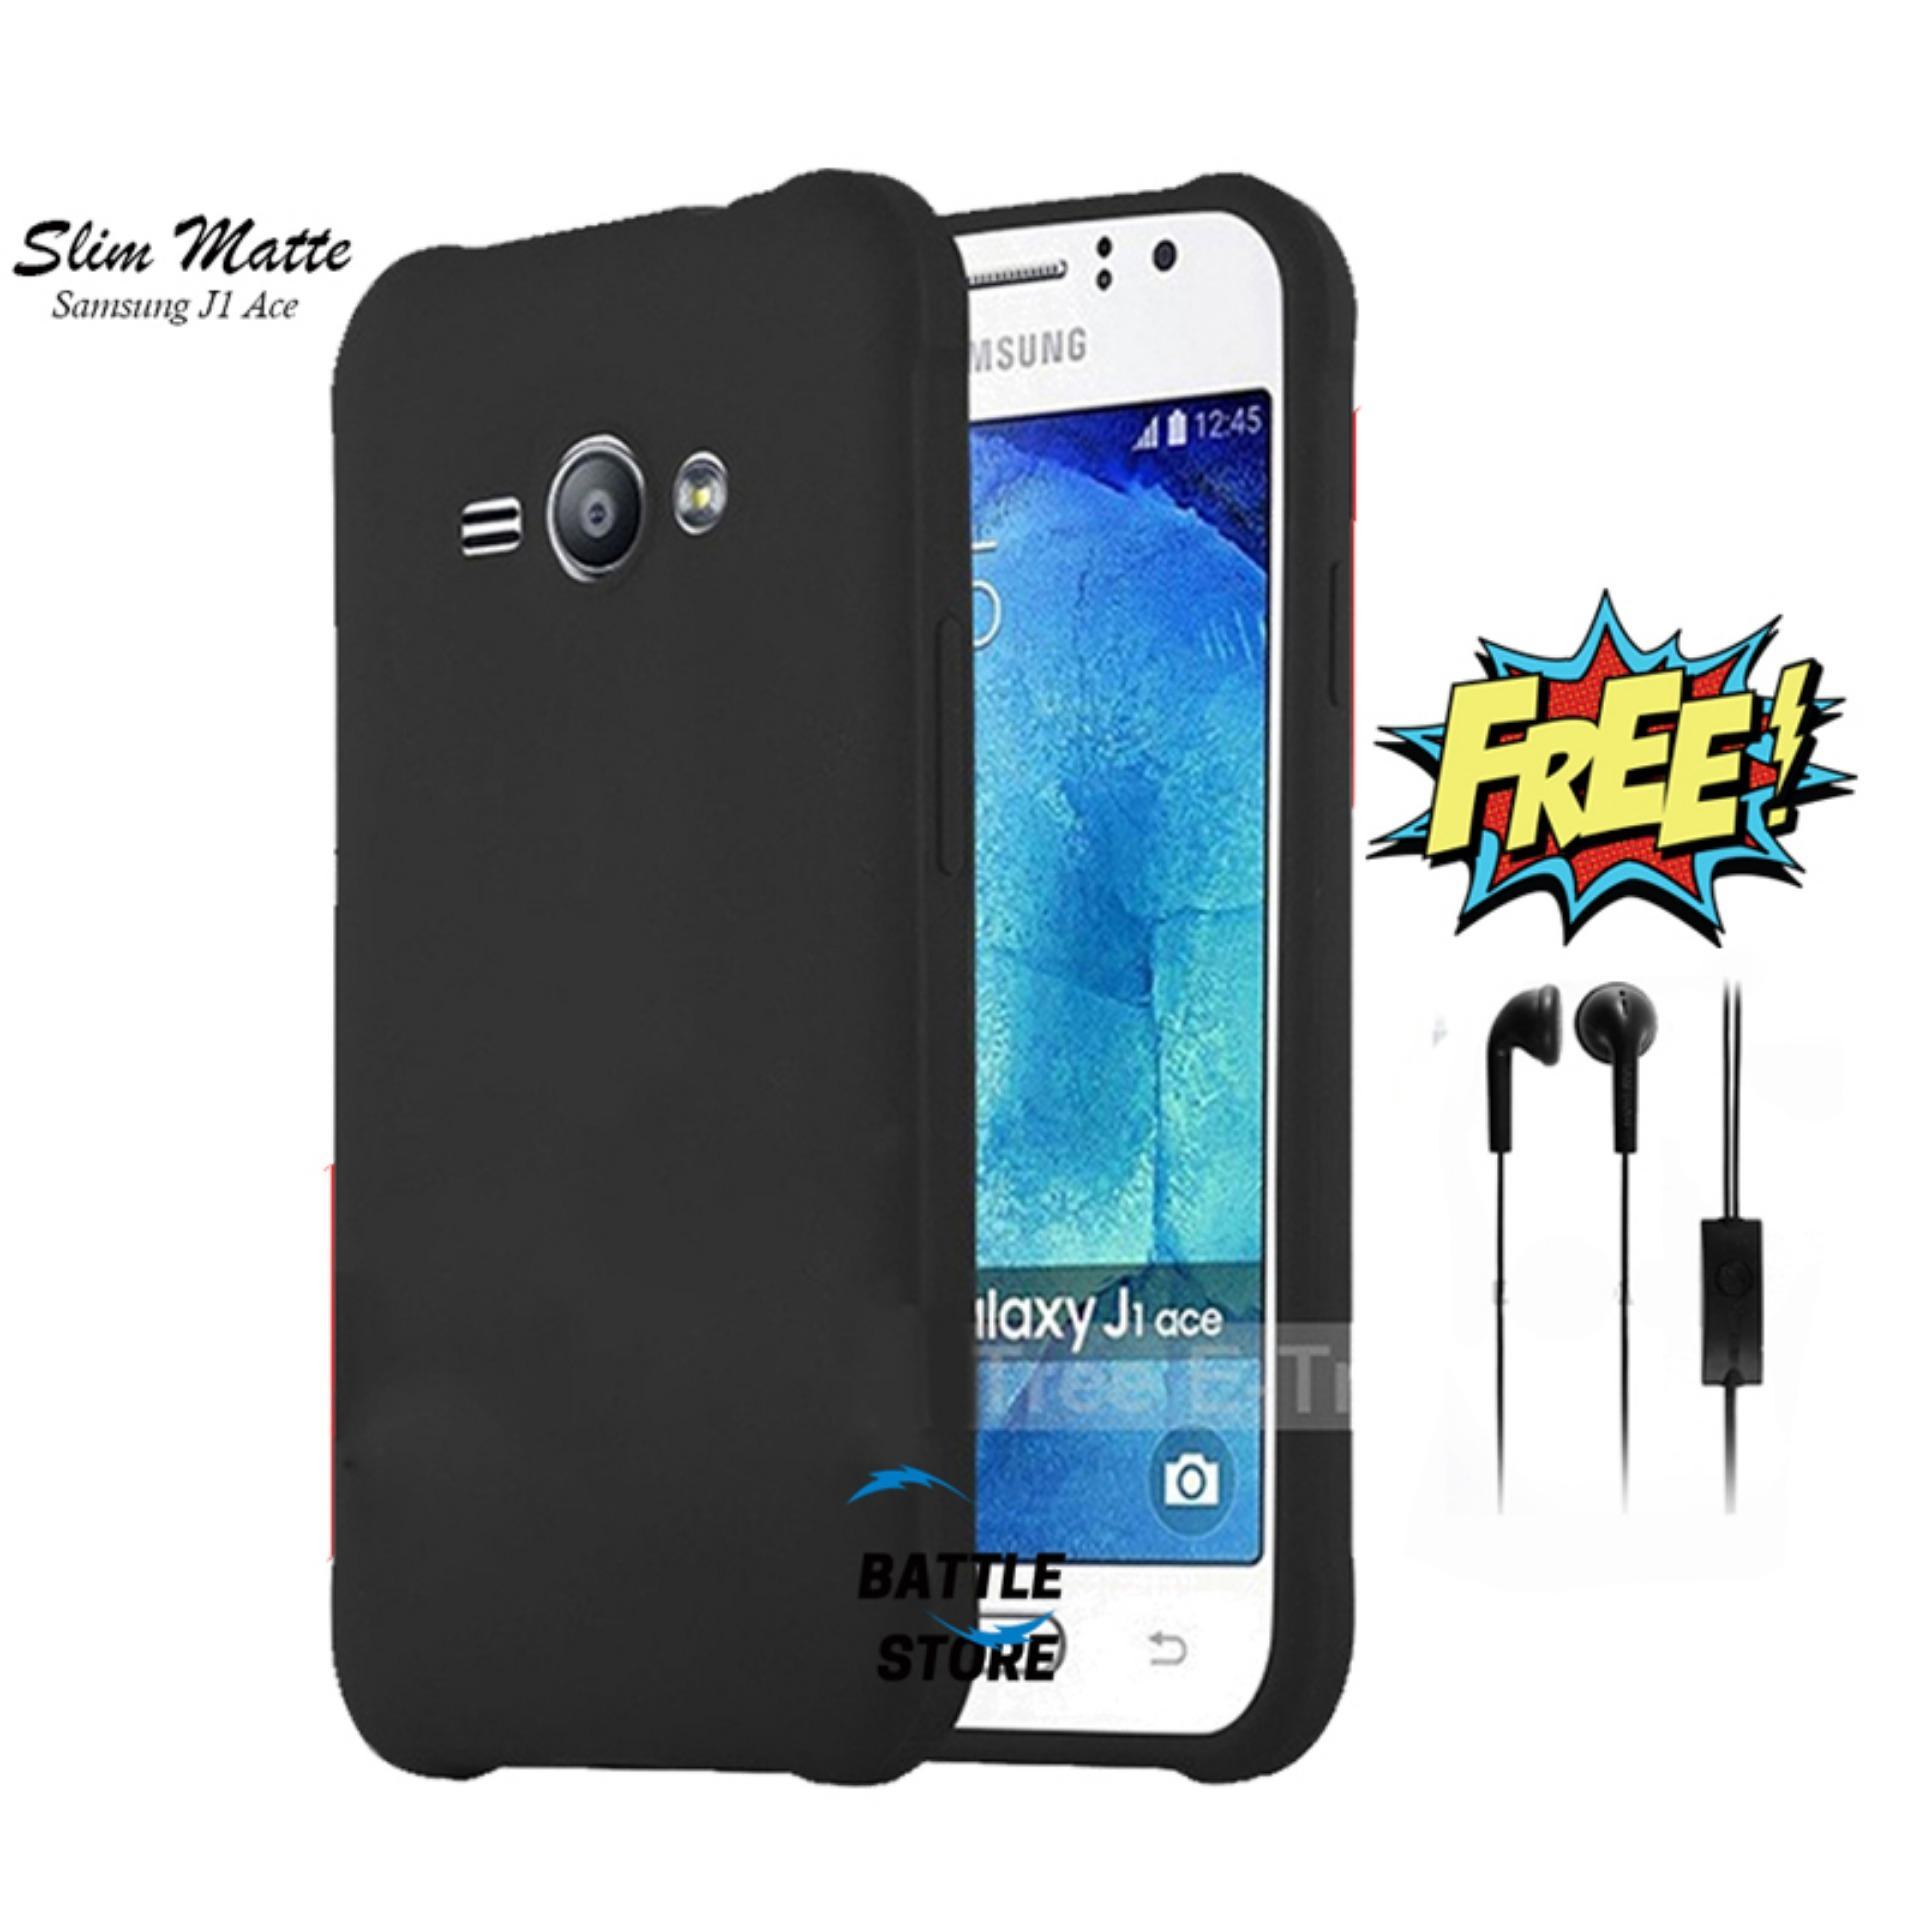 Case Slim Black Matte Samsung Galaxy J1 Ace J111f Baby Skin Softcase Ultra Thin